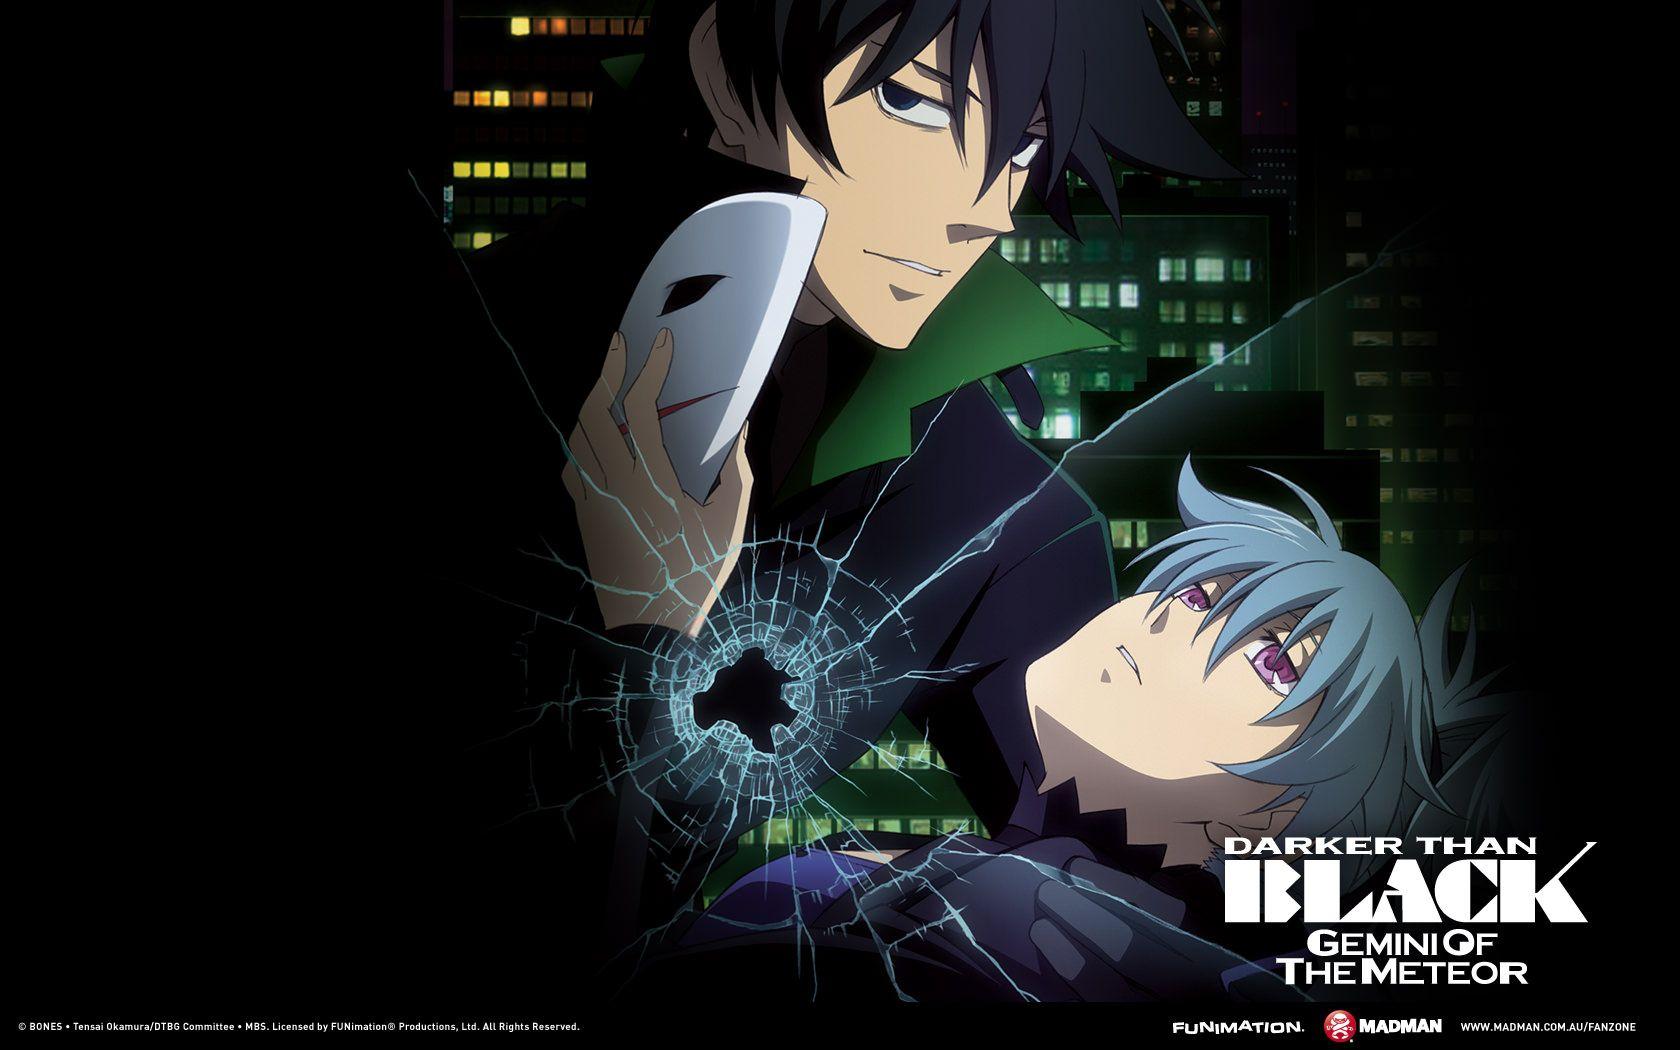 Pin by Sakura on Anime Characters/Misc Ova, Anime